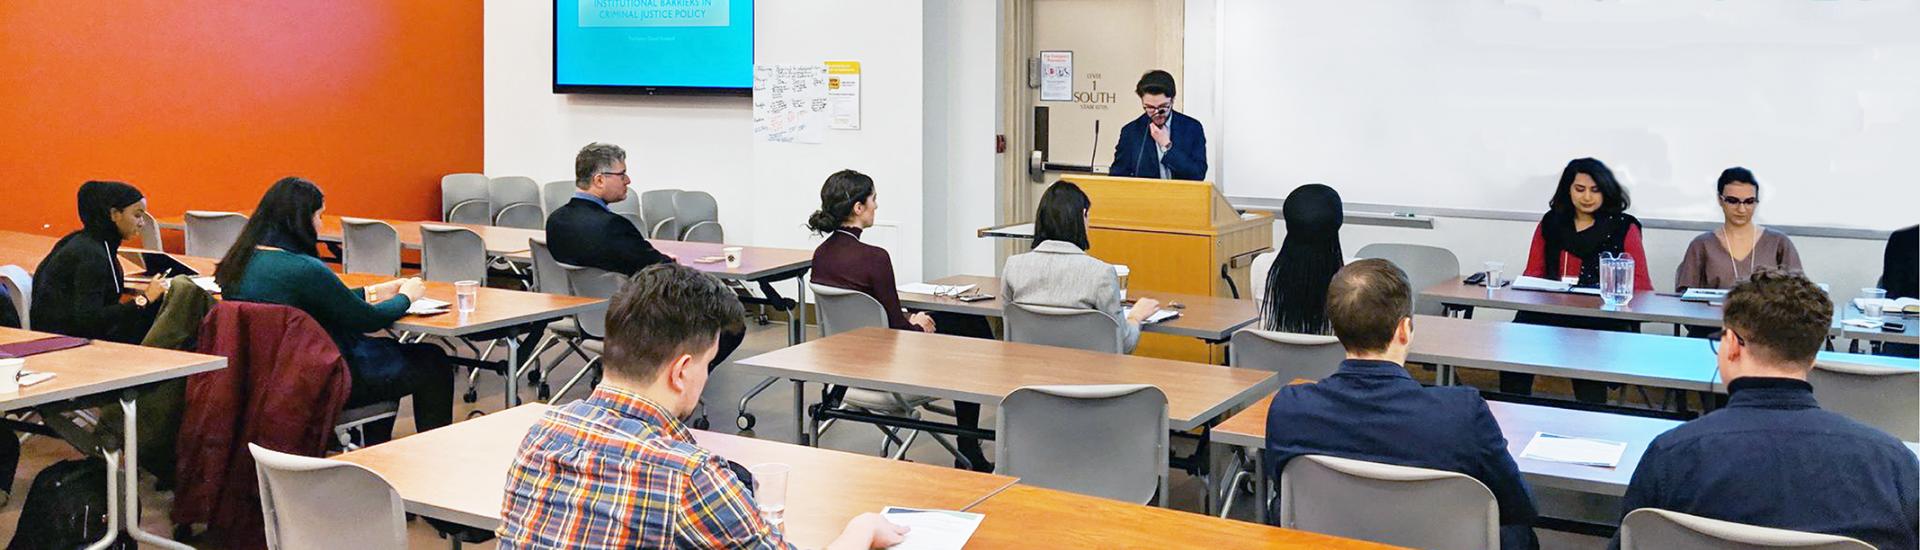 Graduate students present in a classroom